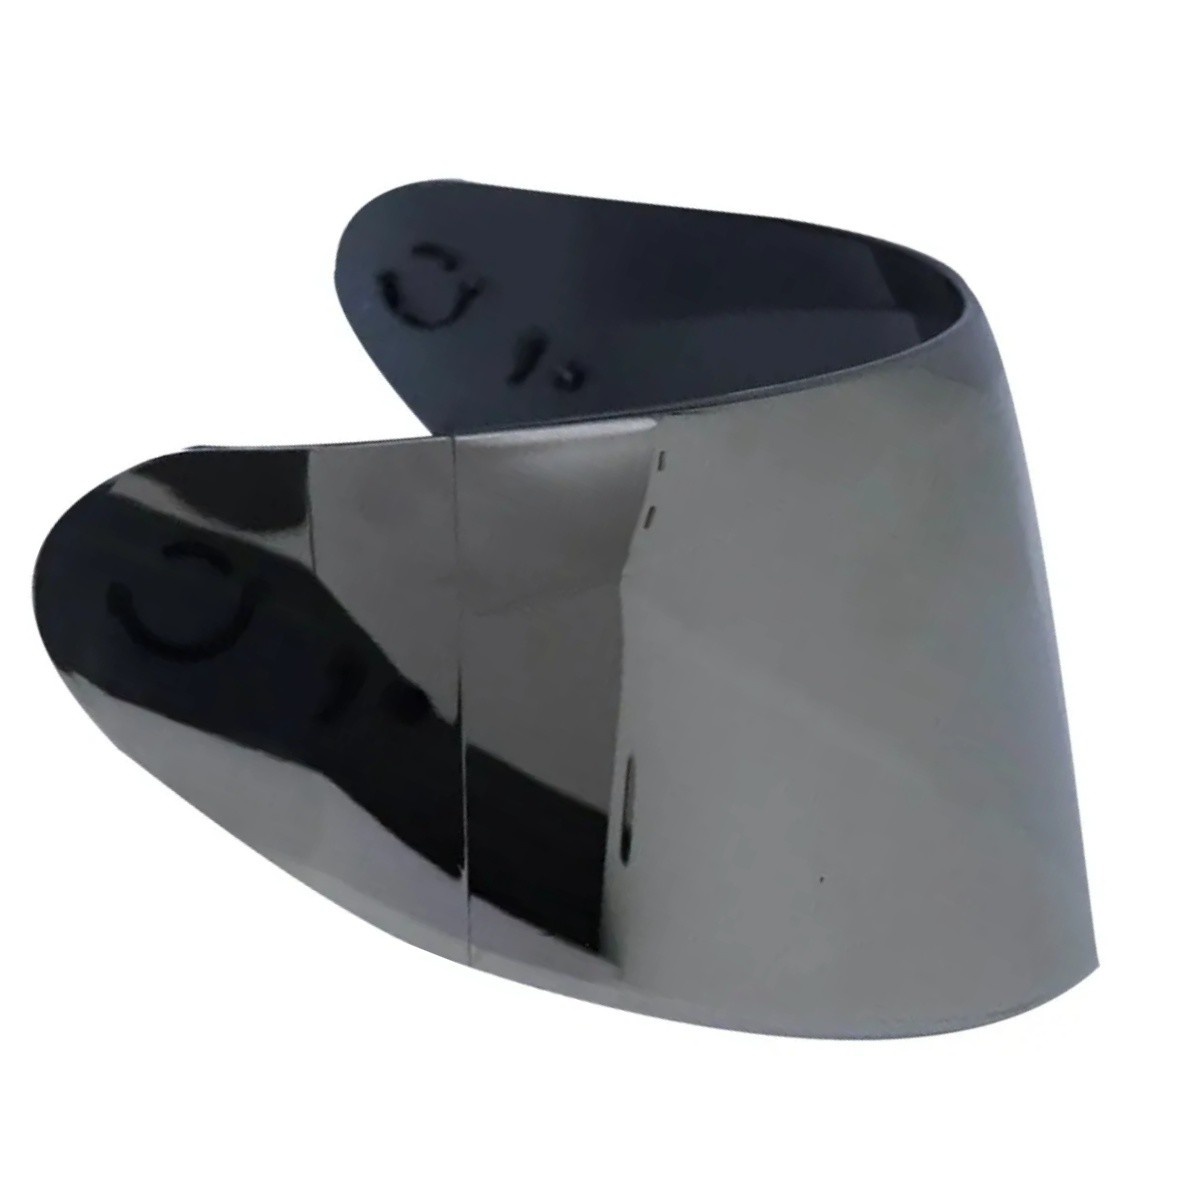 KIT VISEIRA AXXIS EAGLE/DRAKEN SILVER METAL V18 + VISEIRA CLEAR CRISTAL